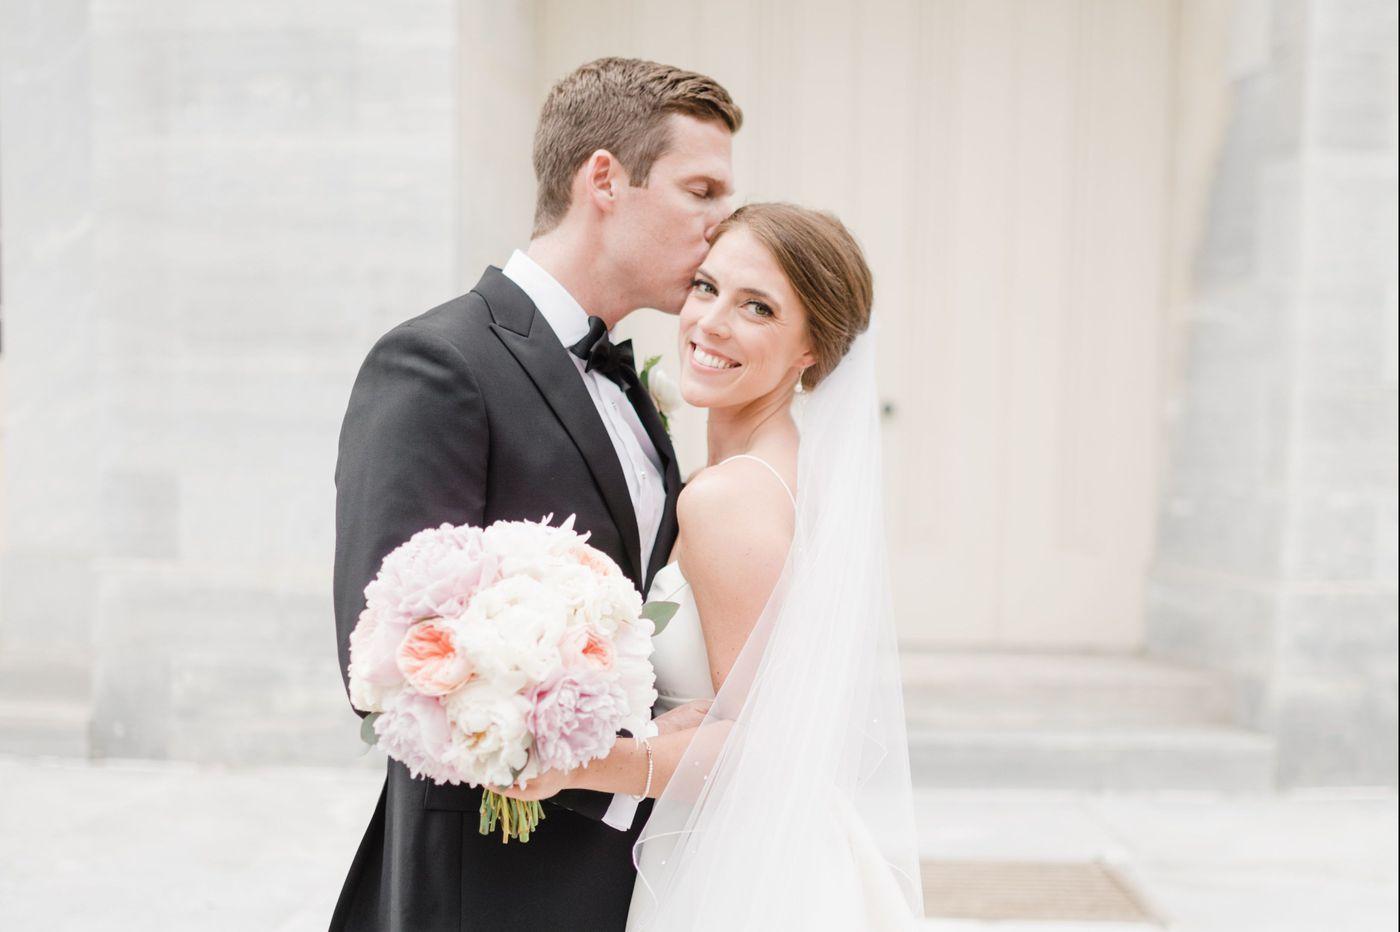 Philadelphia weddings: Gwen Silverman and Peter Hunt